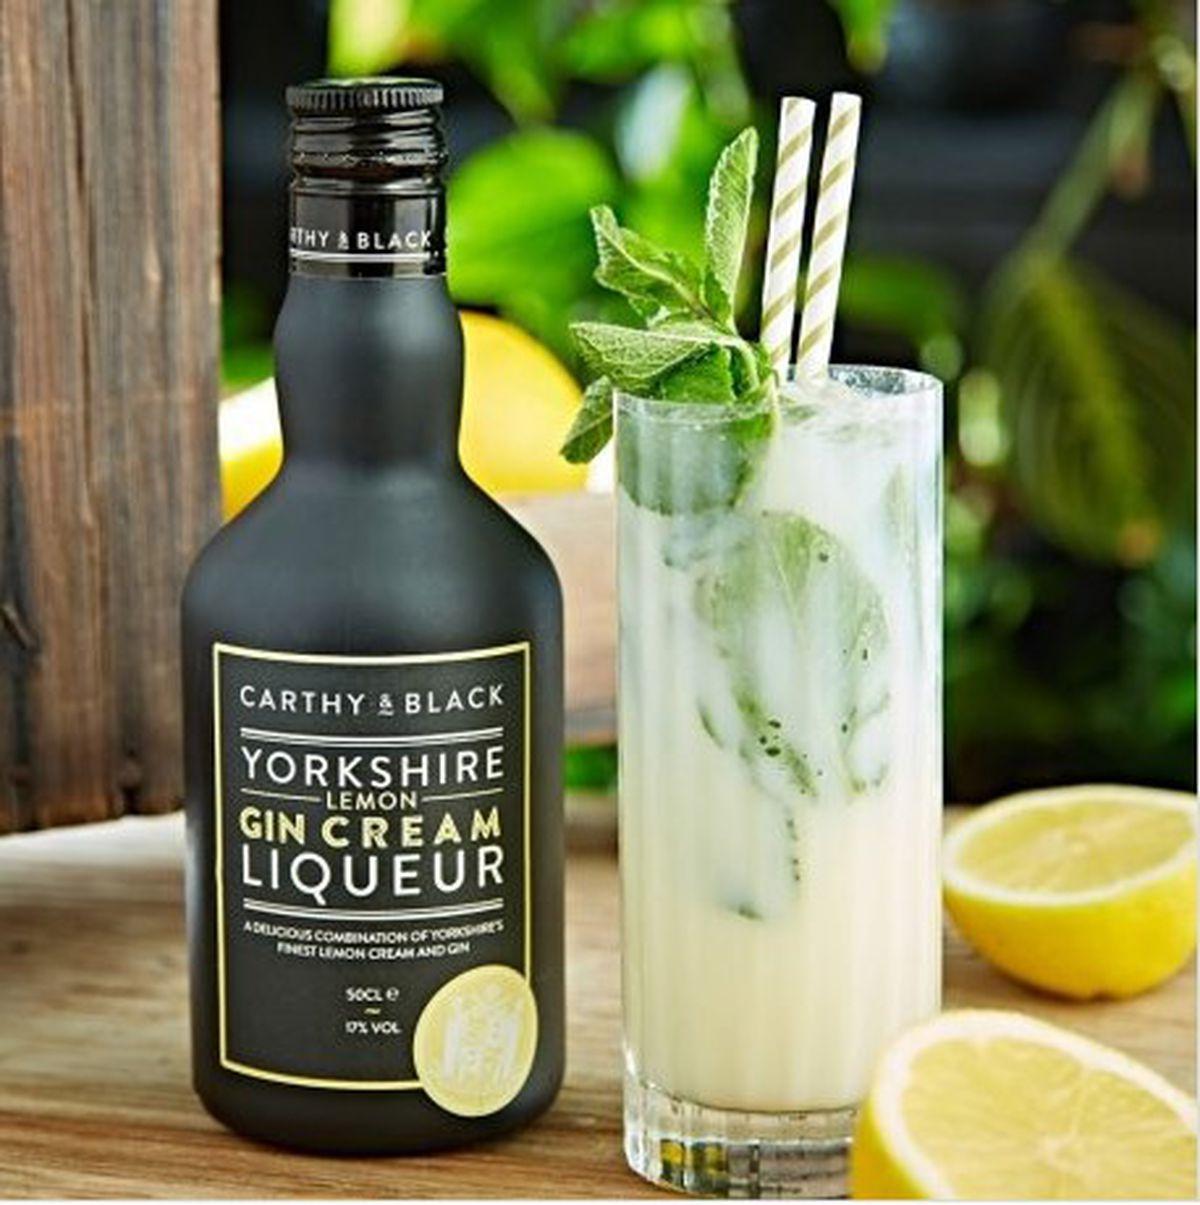 Carthy and Black Yorkshire Lemon Gin Cream Liqueur